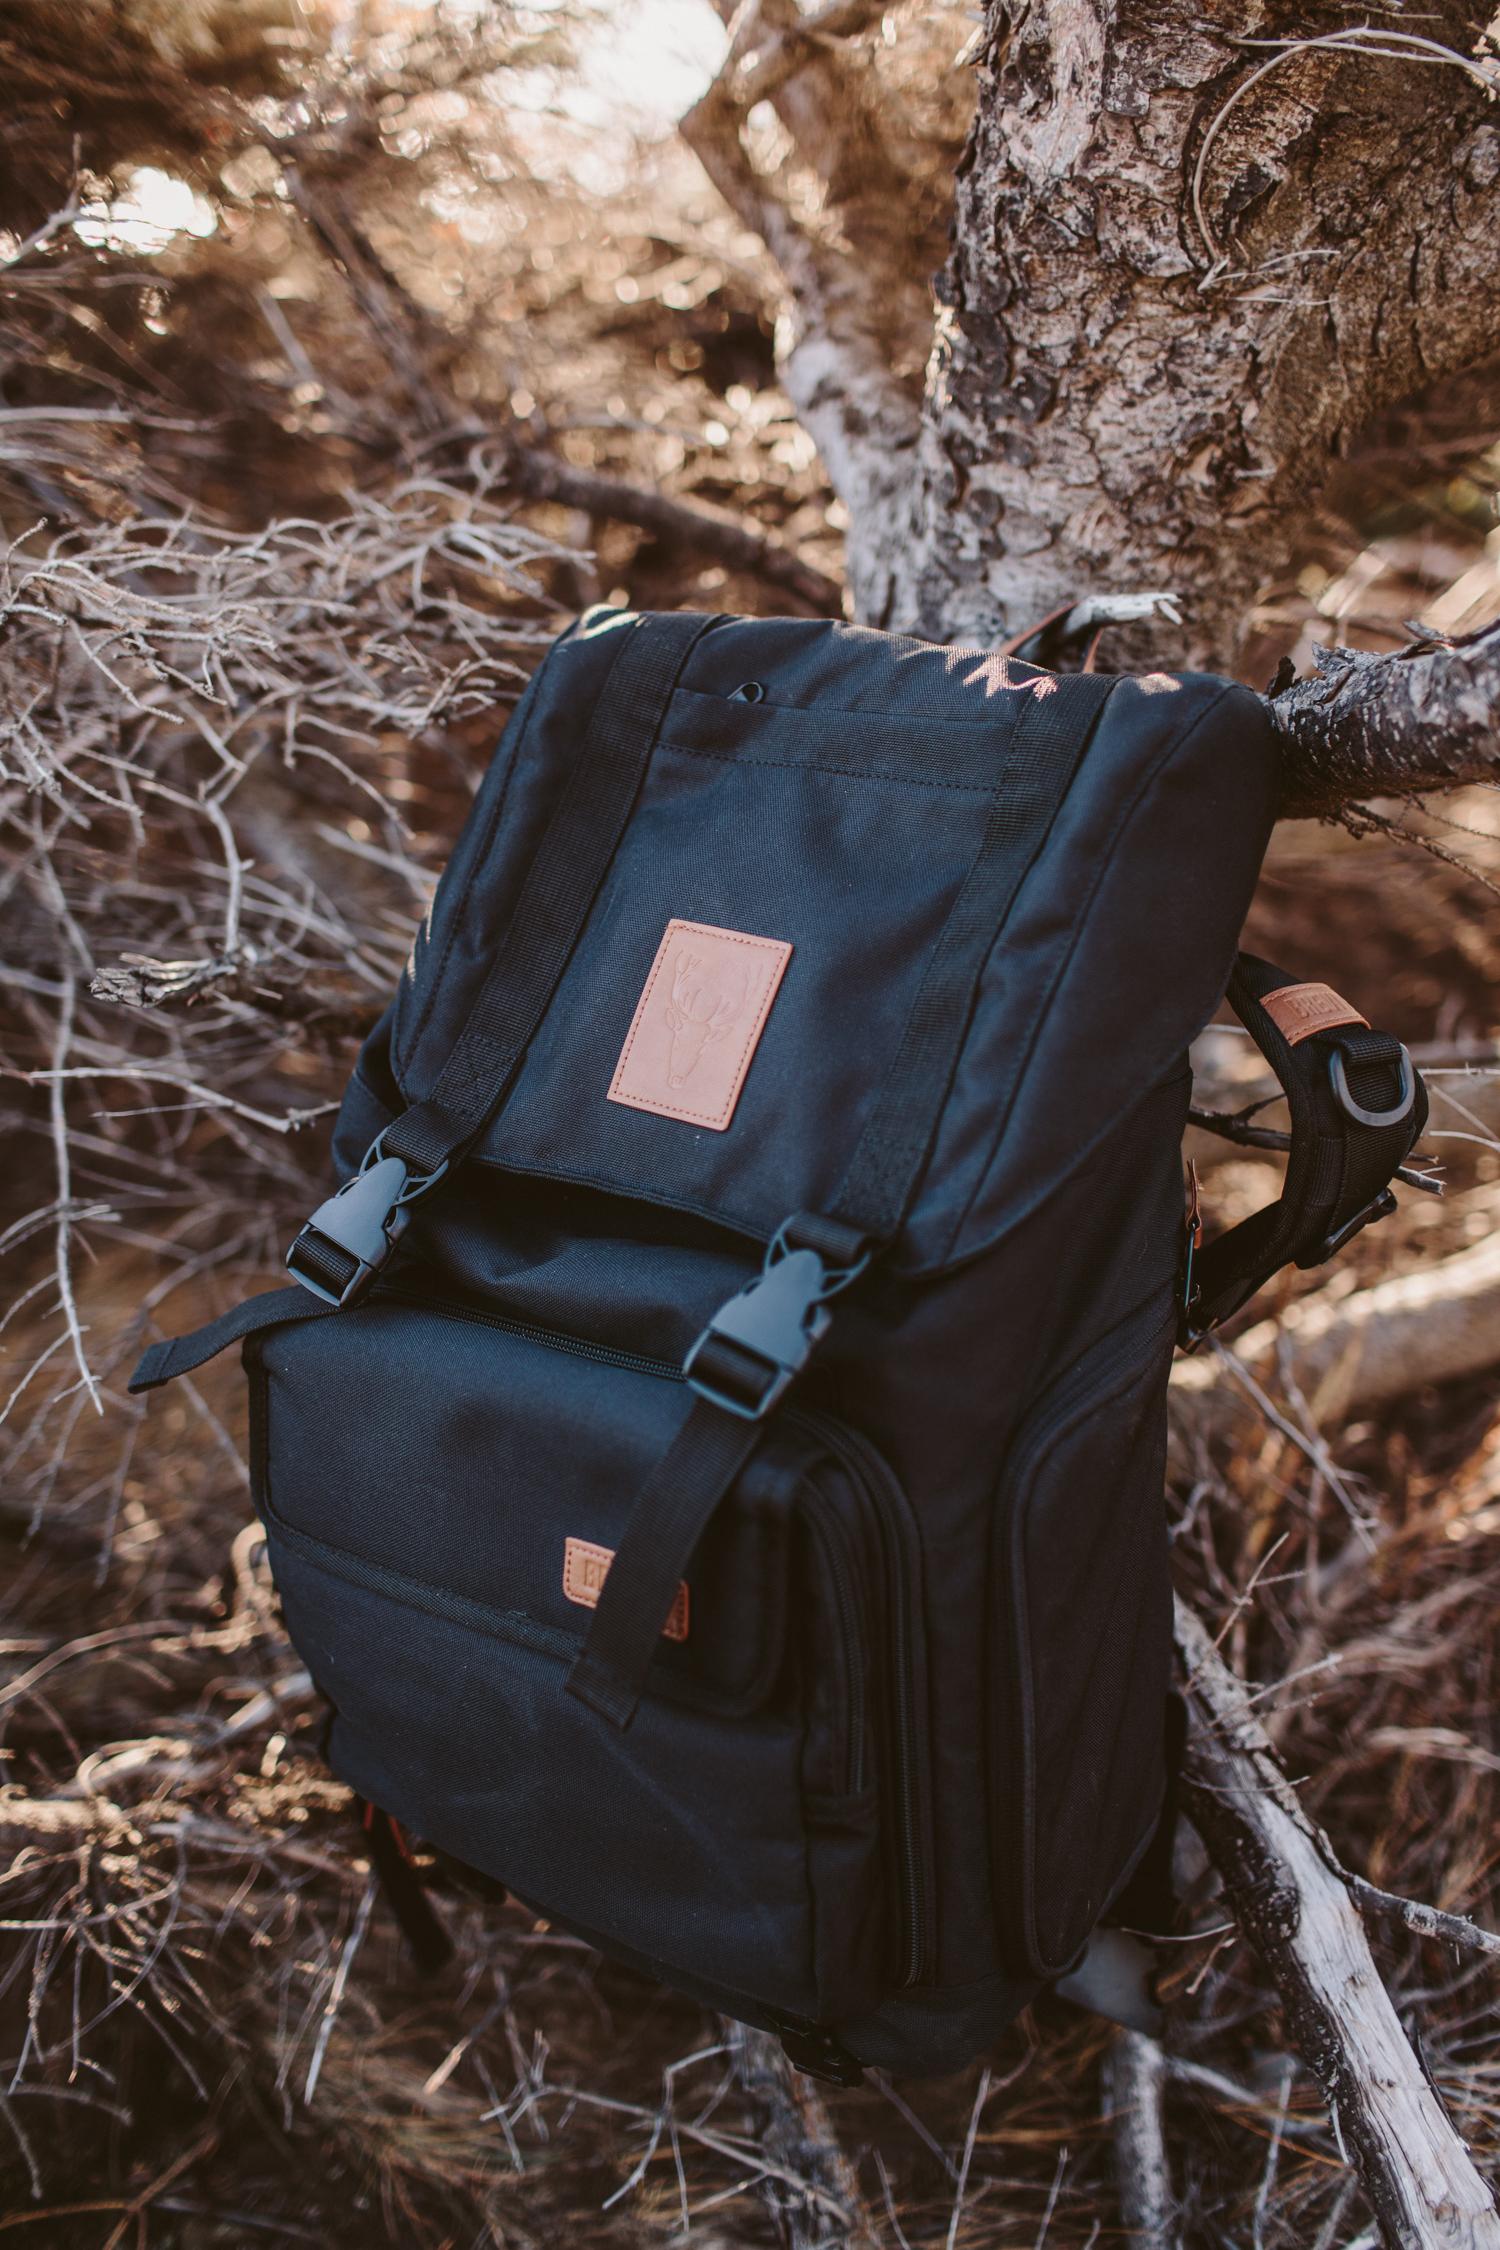 Rugged Camera Bag Review Roundup